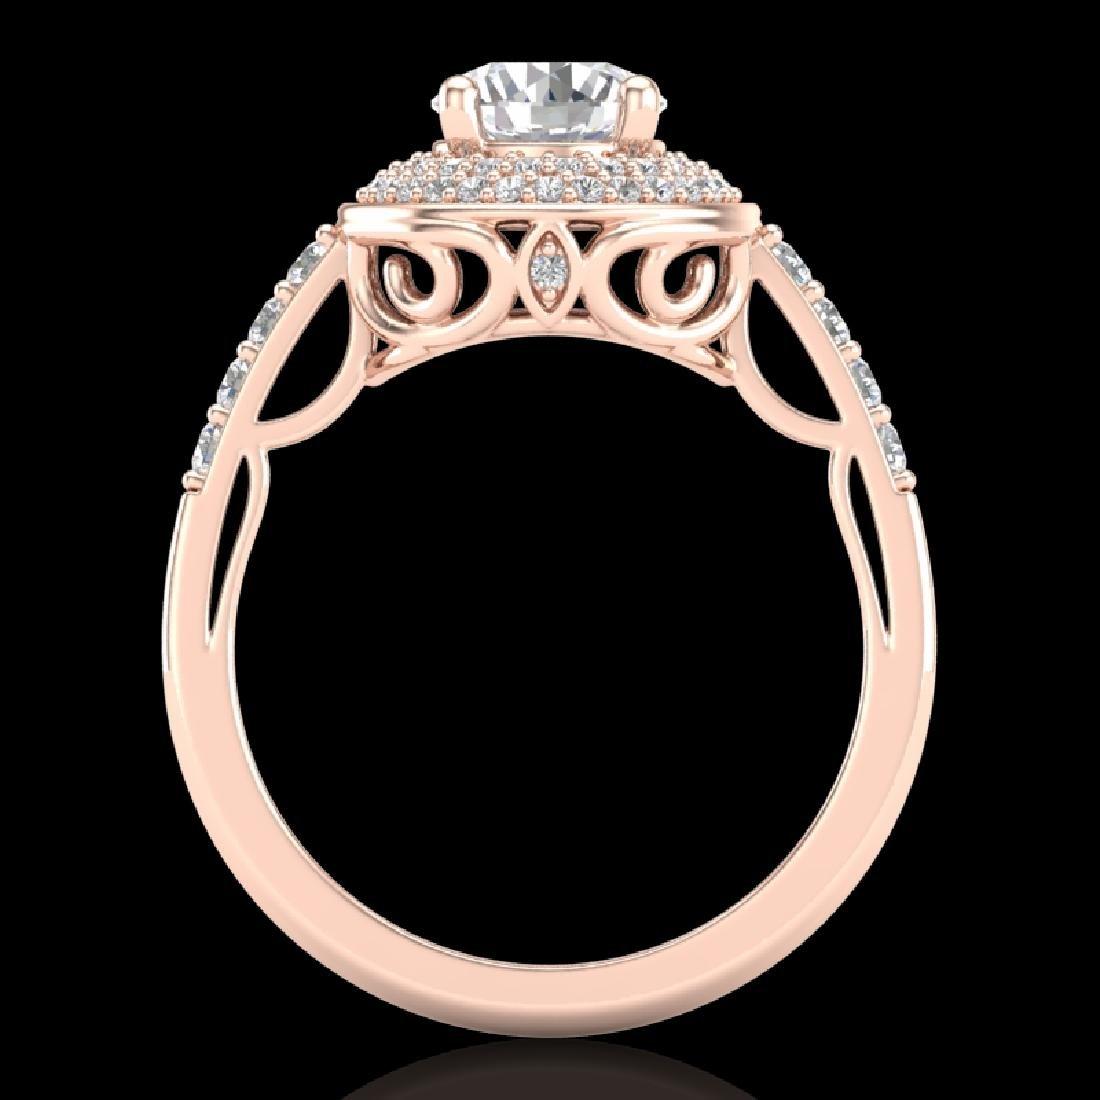 1.7 CTW VS/SI Diamond Solitaire Art Deco Ring 18K Rose